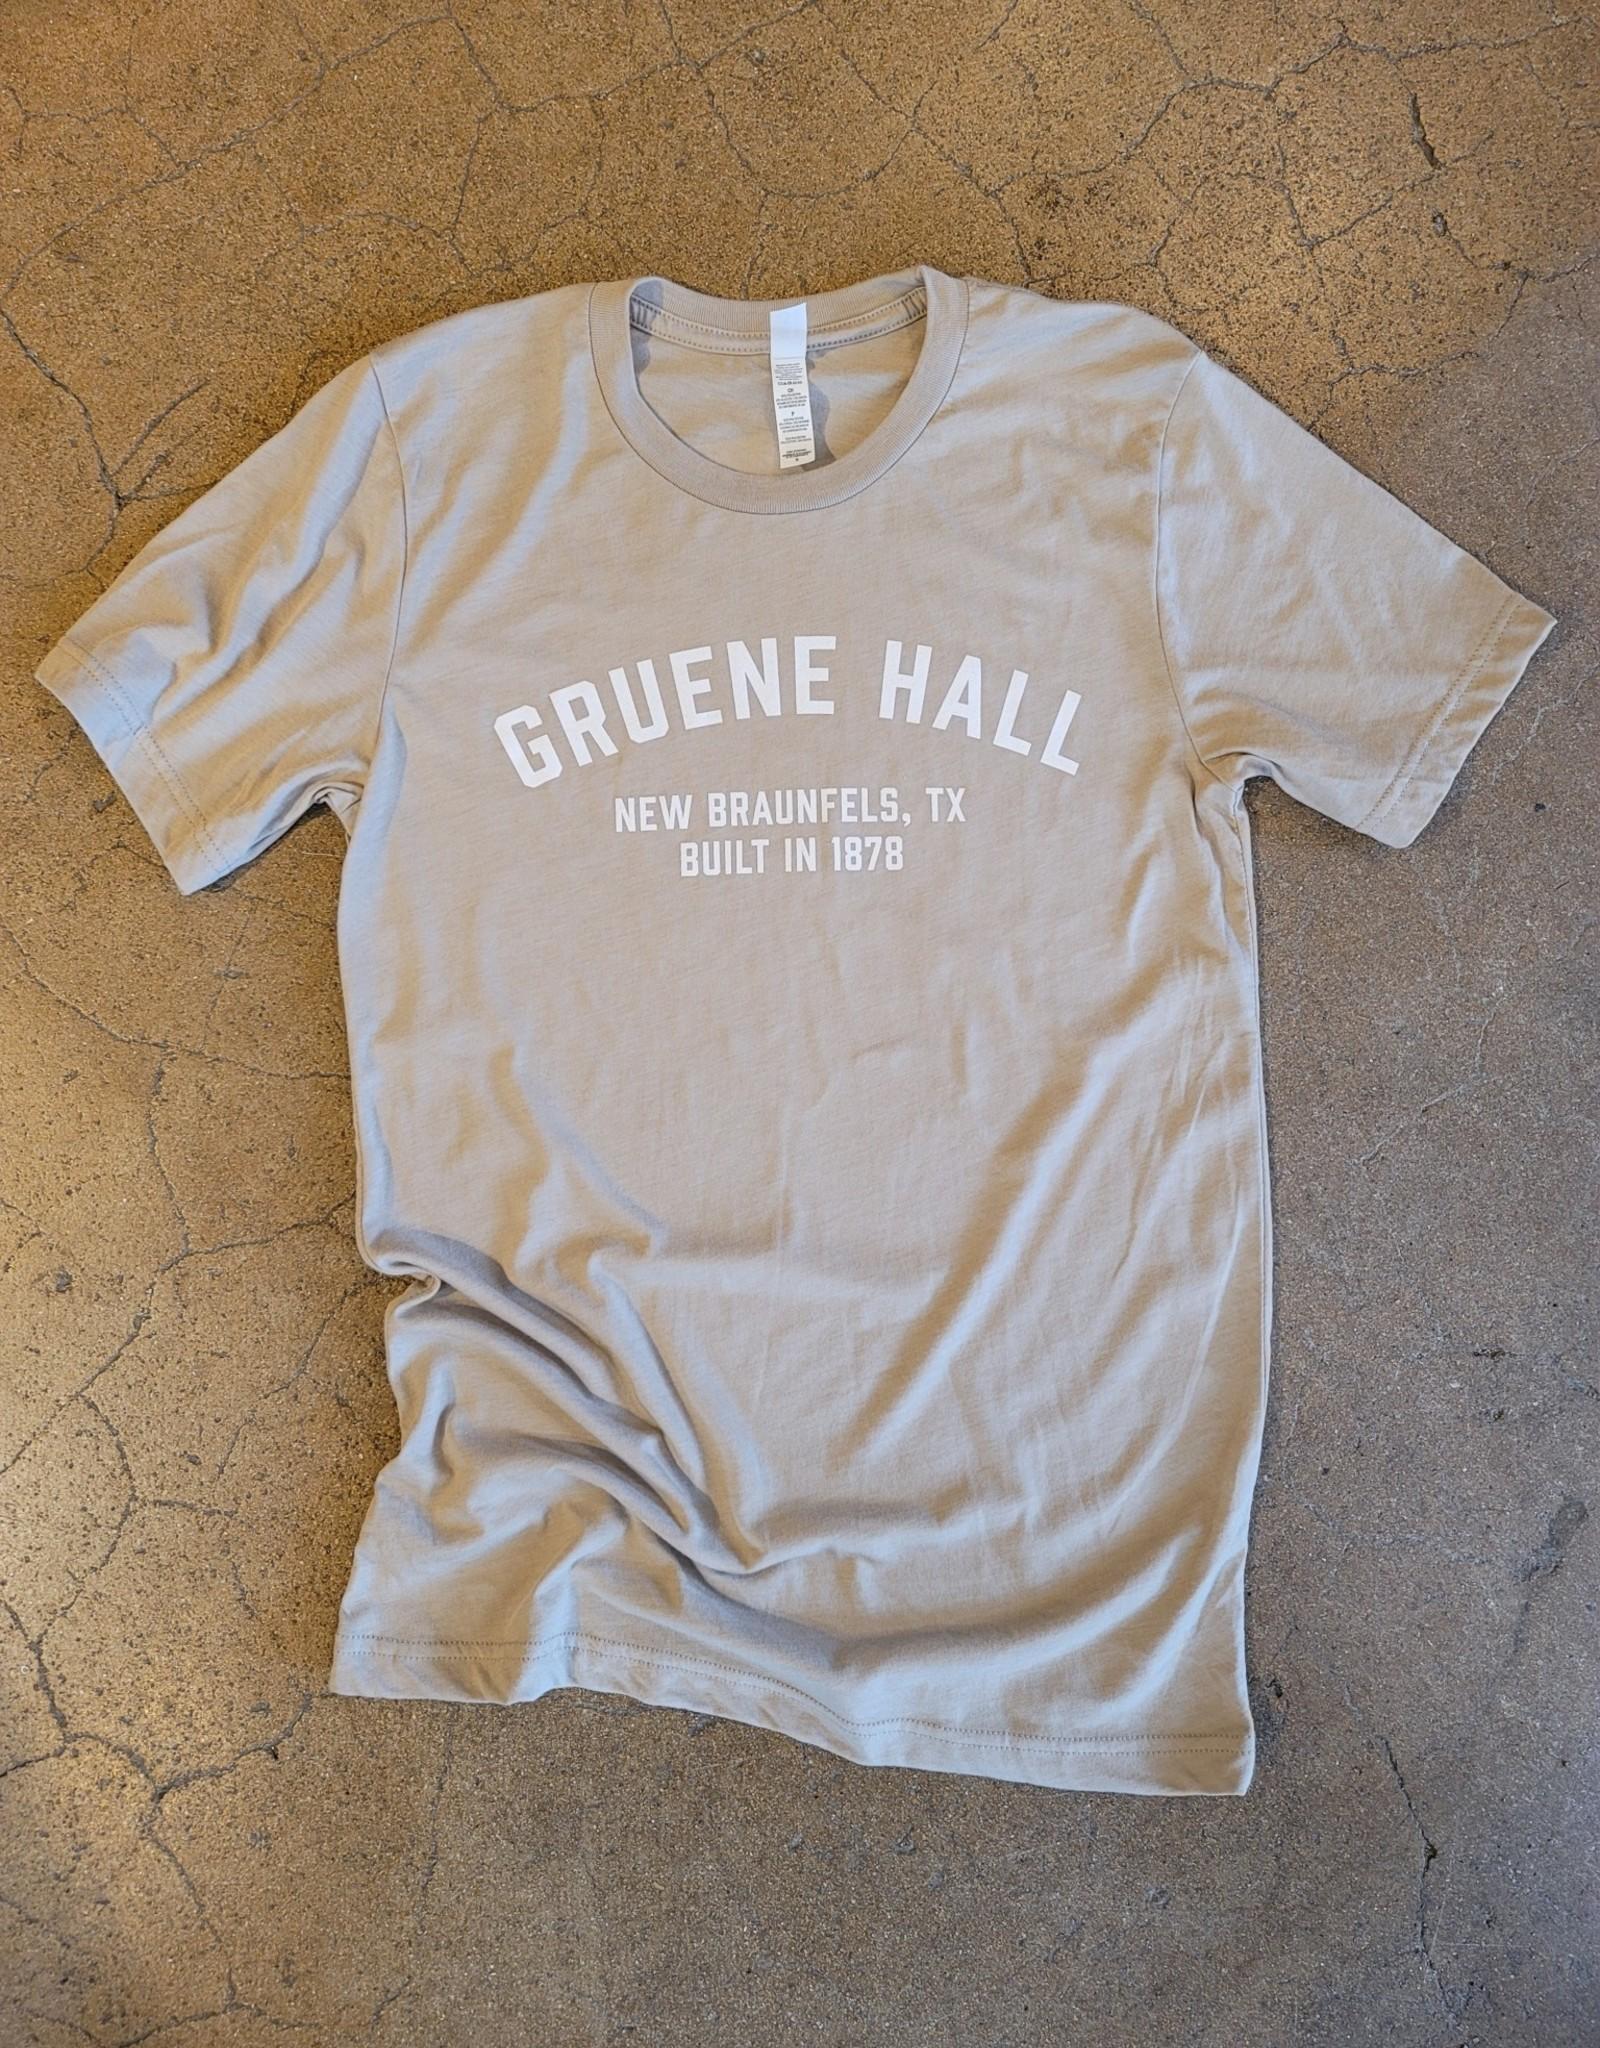 Gruene Hall 1878 Tee